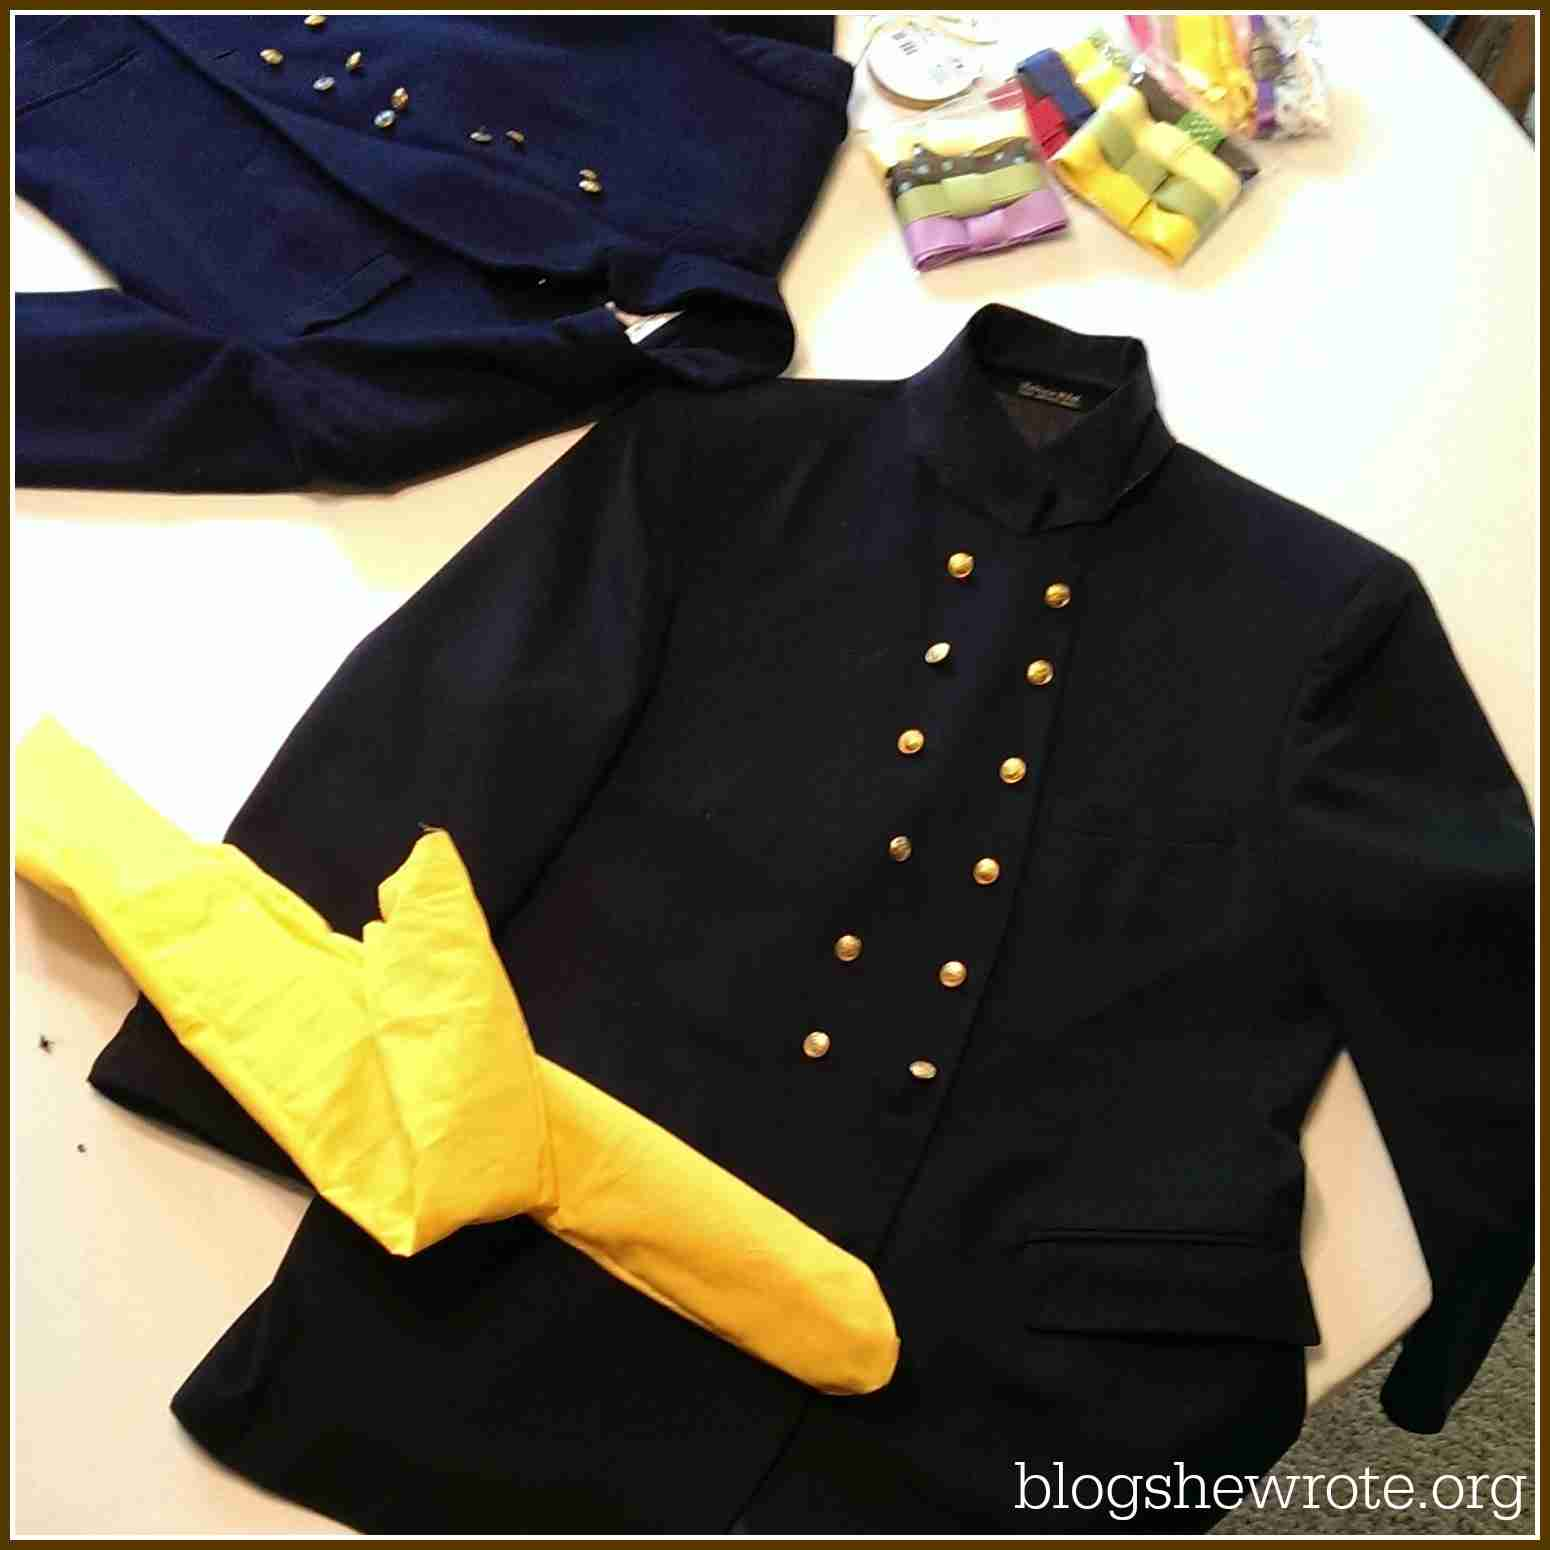 Blog, She Wrote: Civil War Uniforms